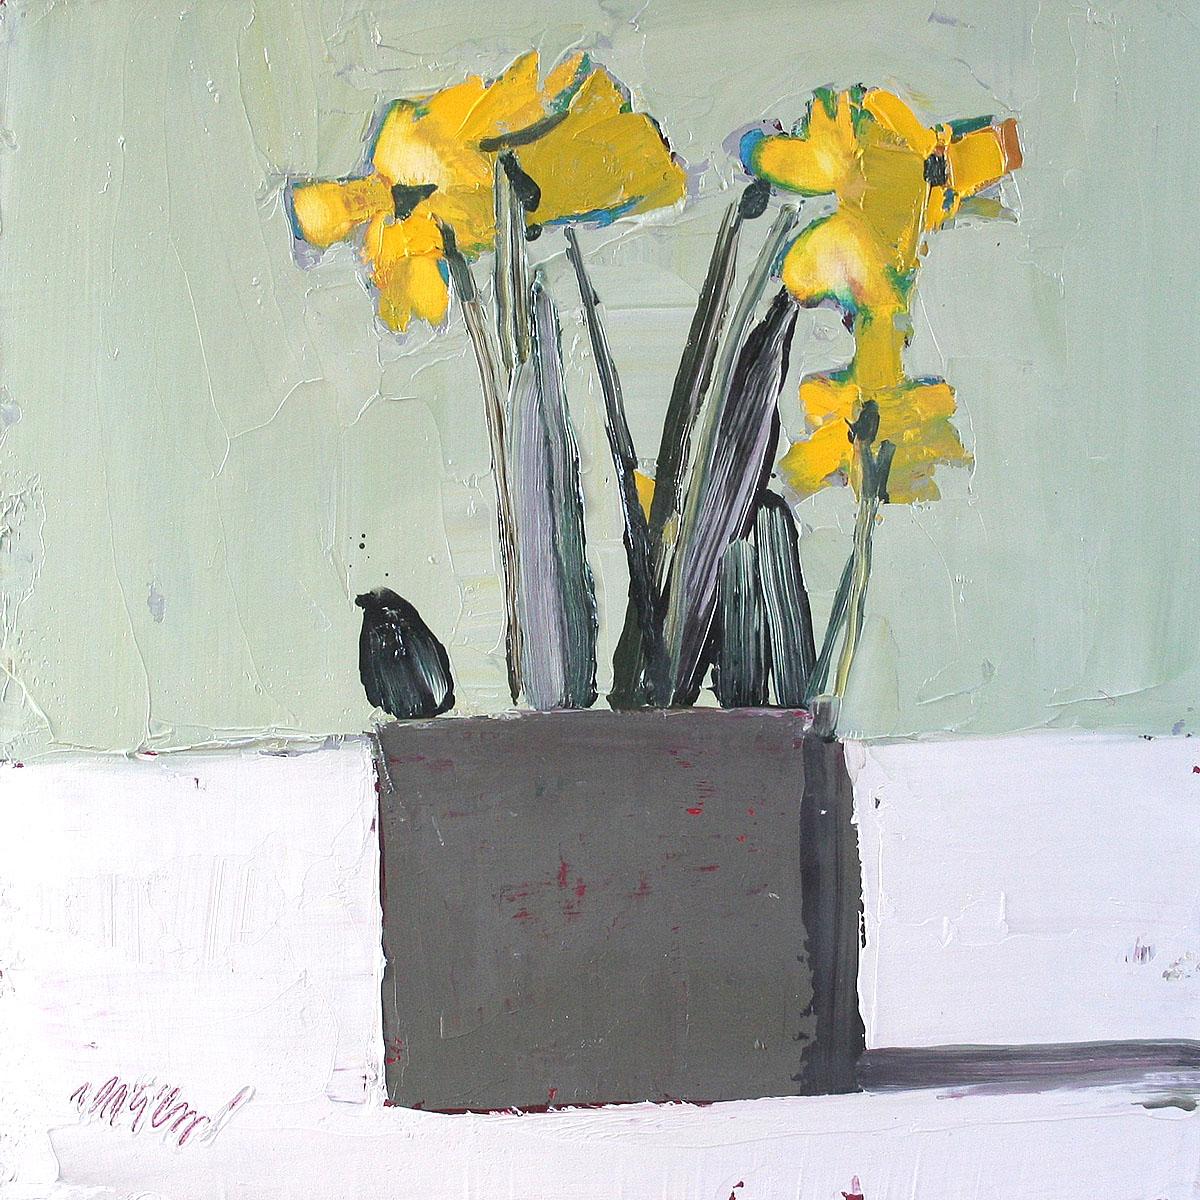 Mhairi McGregor - Daffodils, oil - Daffodils